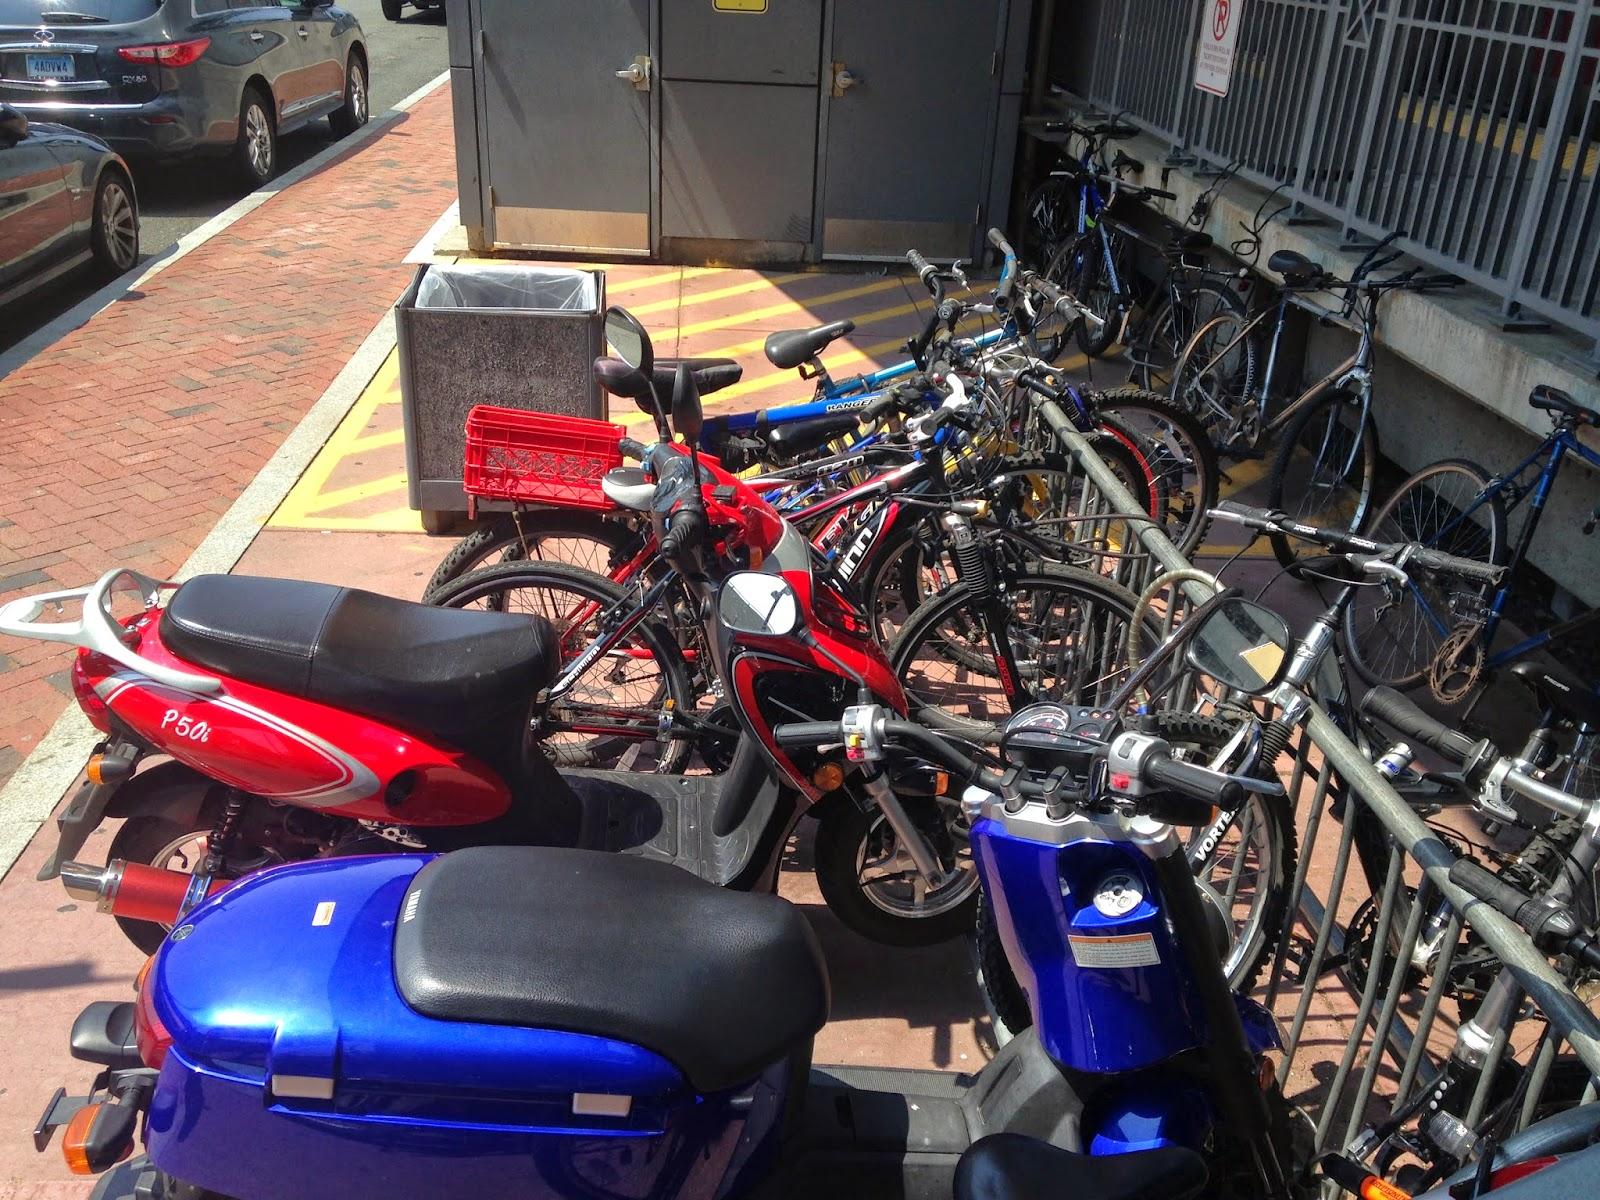 Bikes On Metro North Stamford Metro North station